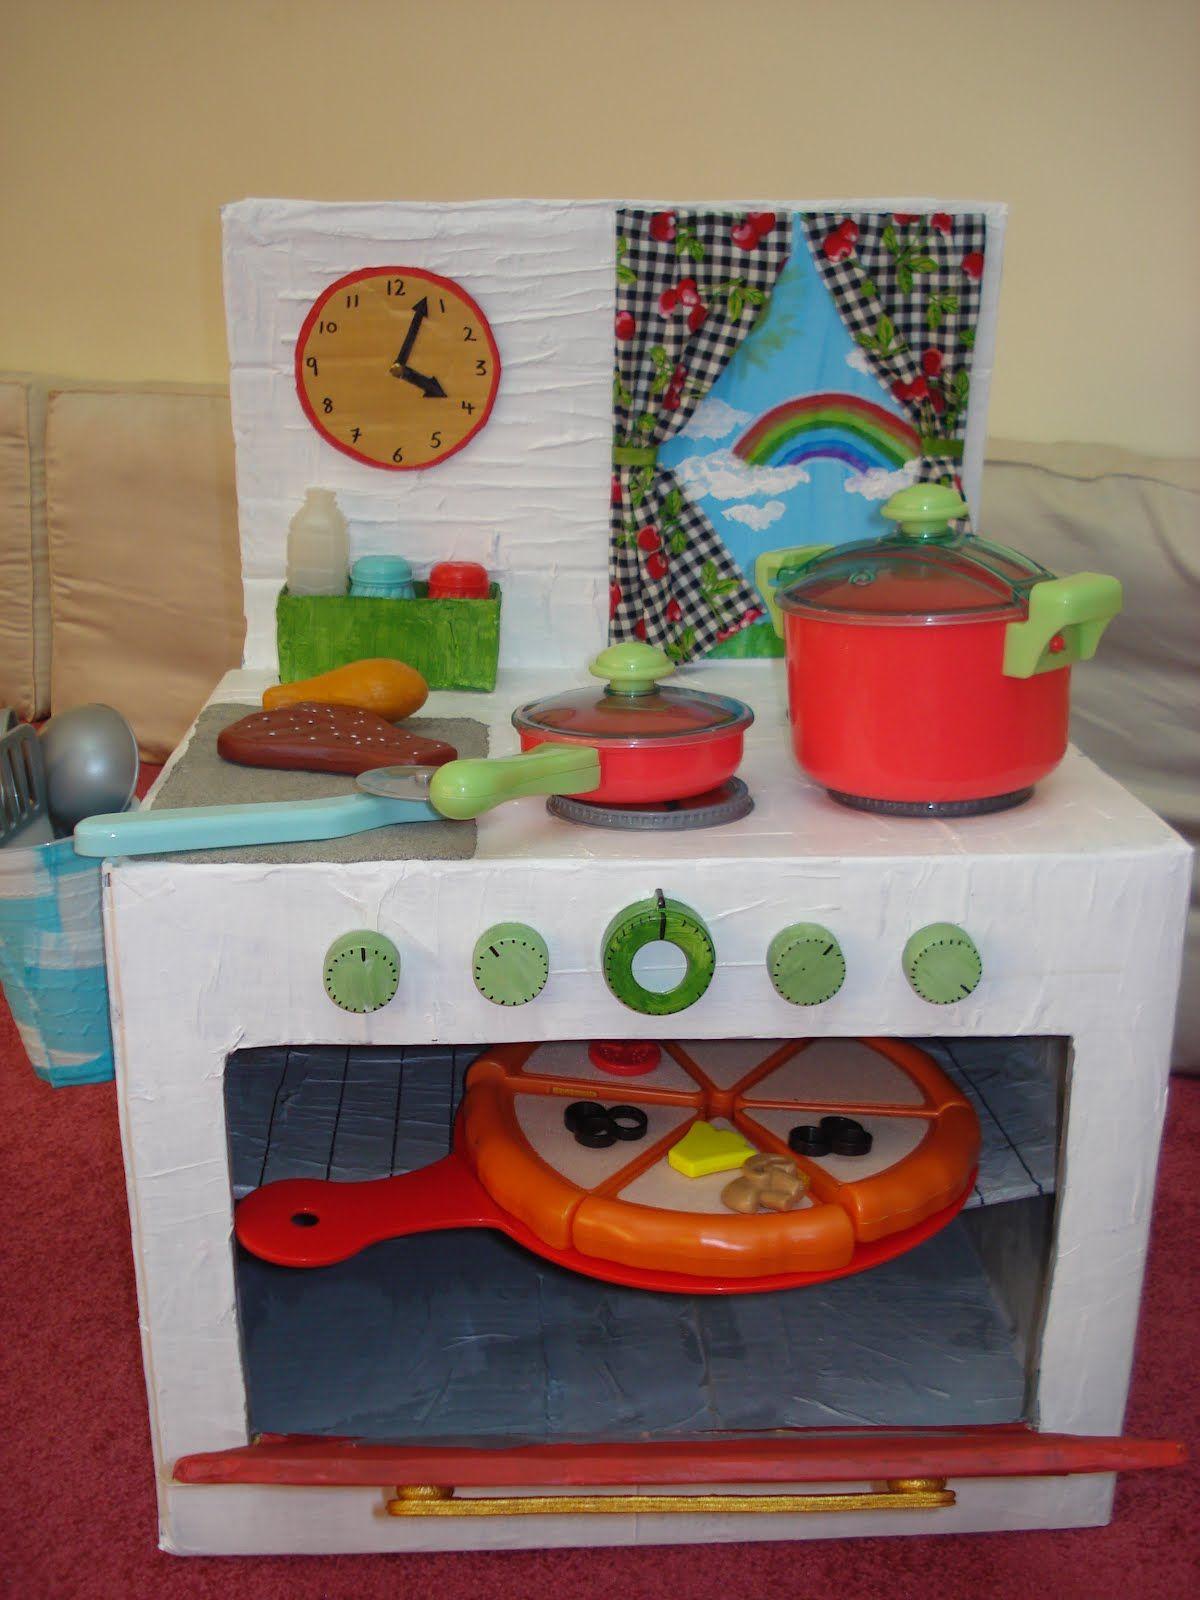 ideen f r kinderk che selber bauen anleitung basteln mit kindern. Black Bedroom Furniture Sets. Home Design Ideas